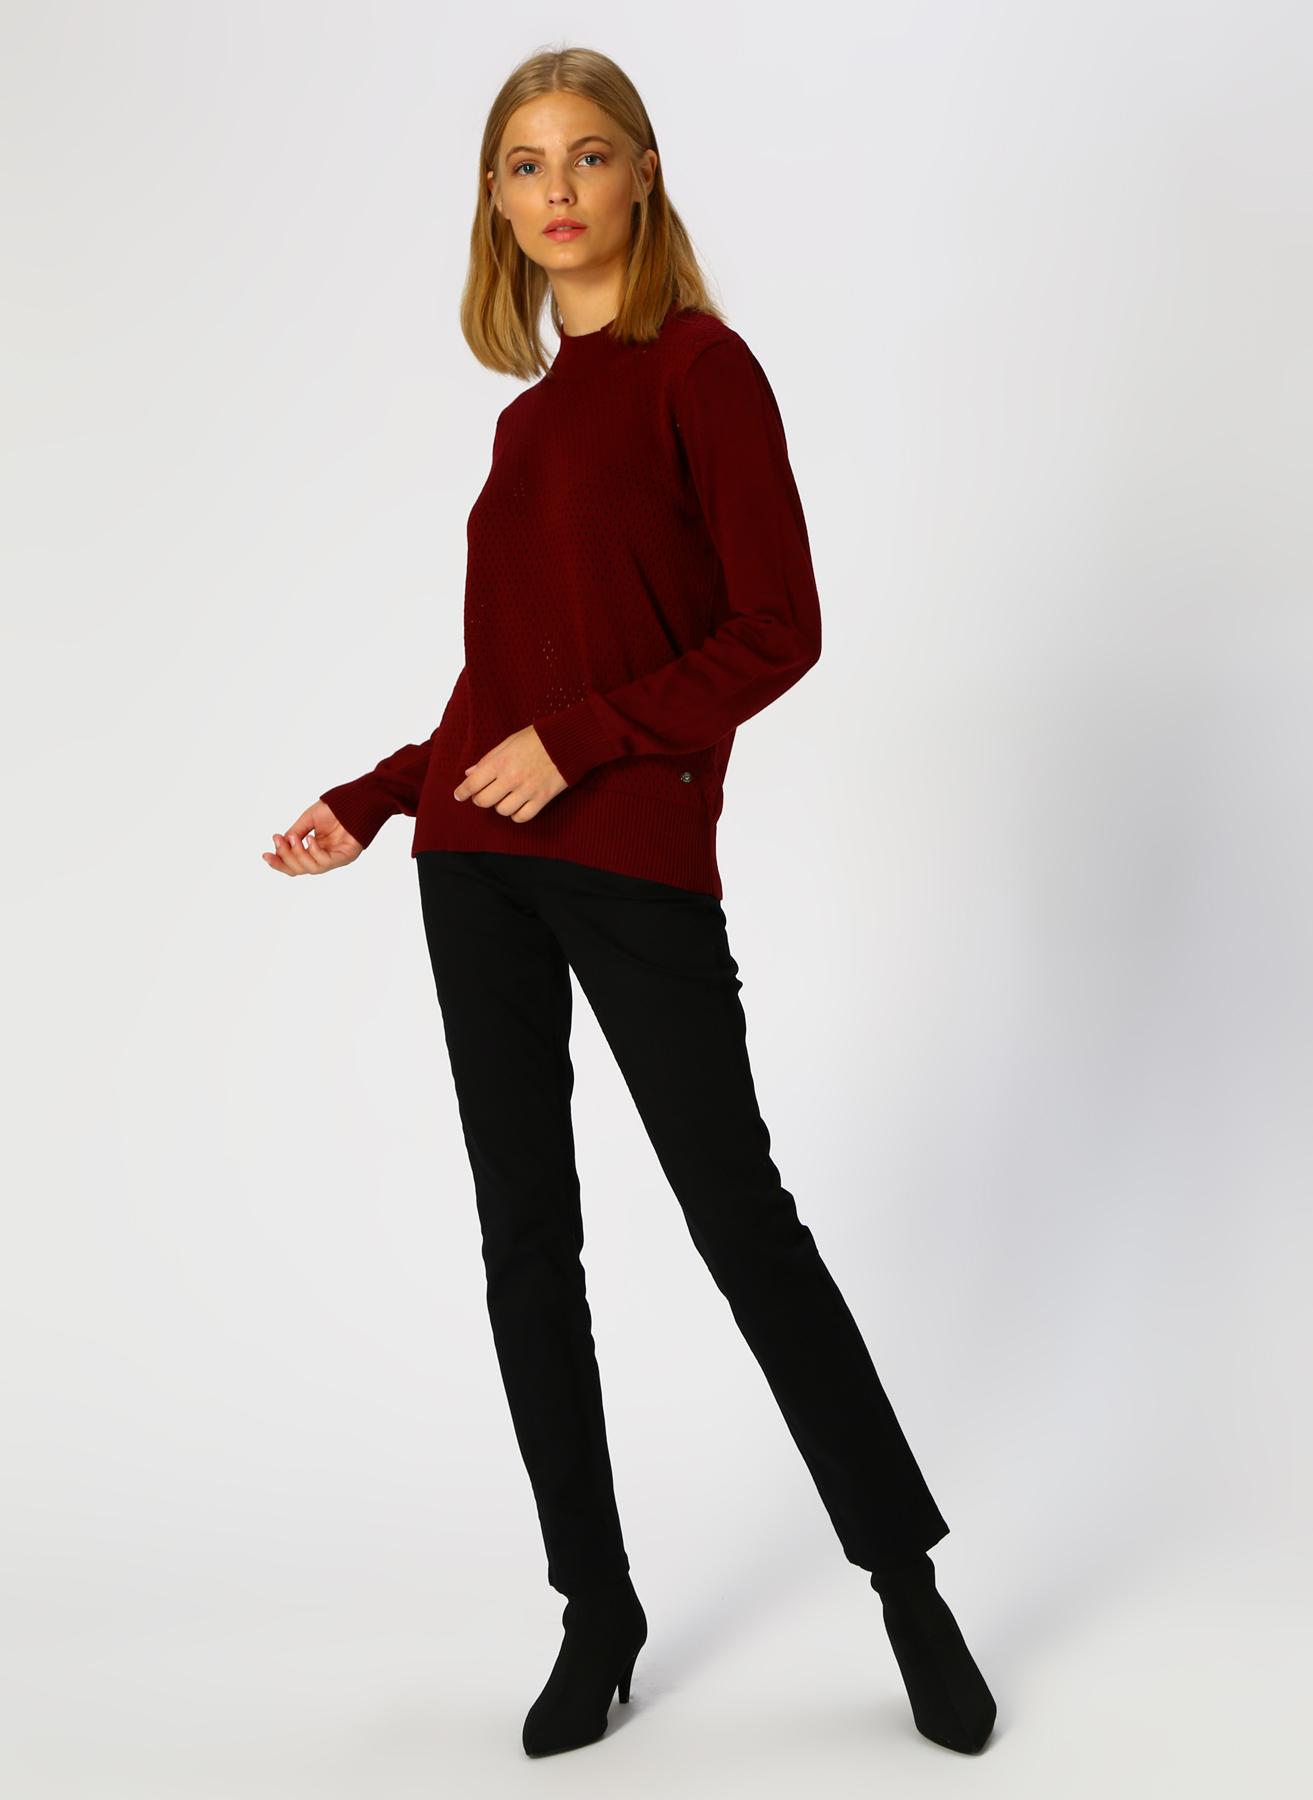 Mustang Siyah Denim Pantolon 26-32 5001698120002 Ürün Resmi